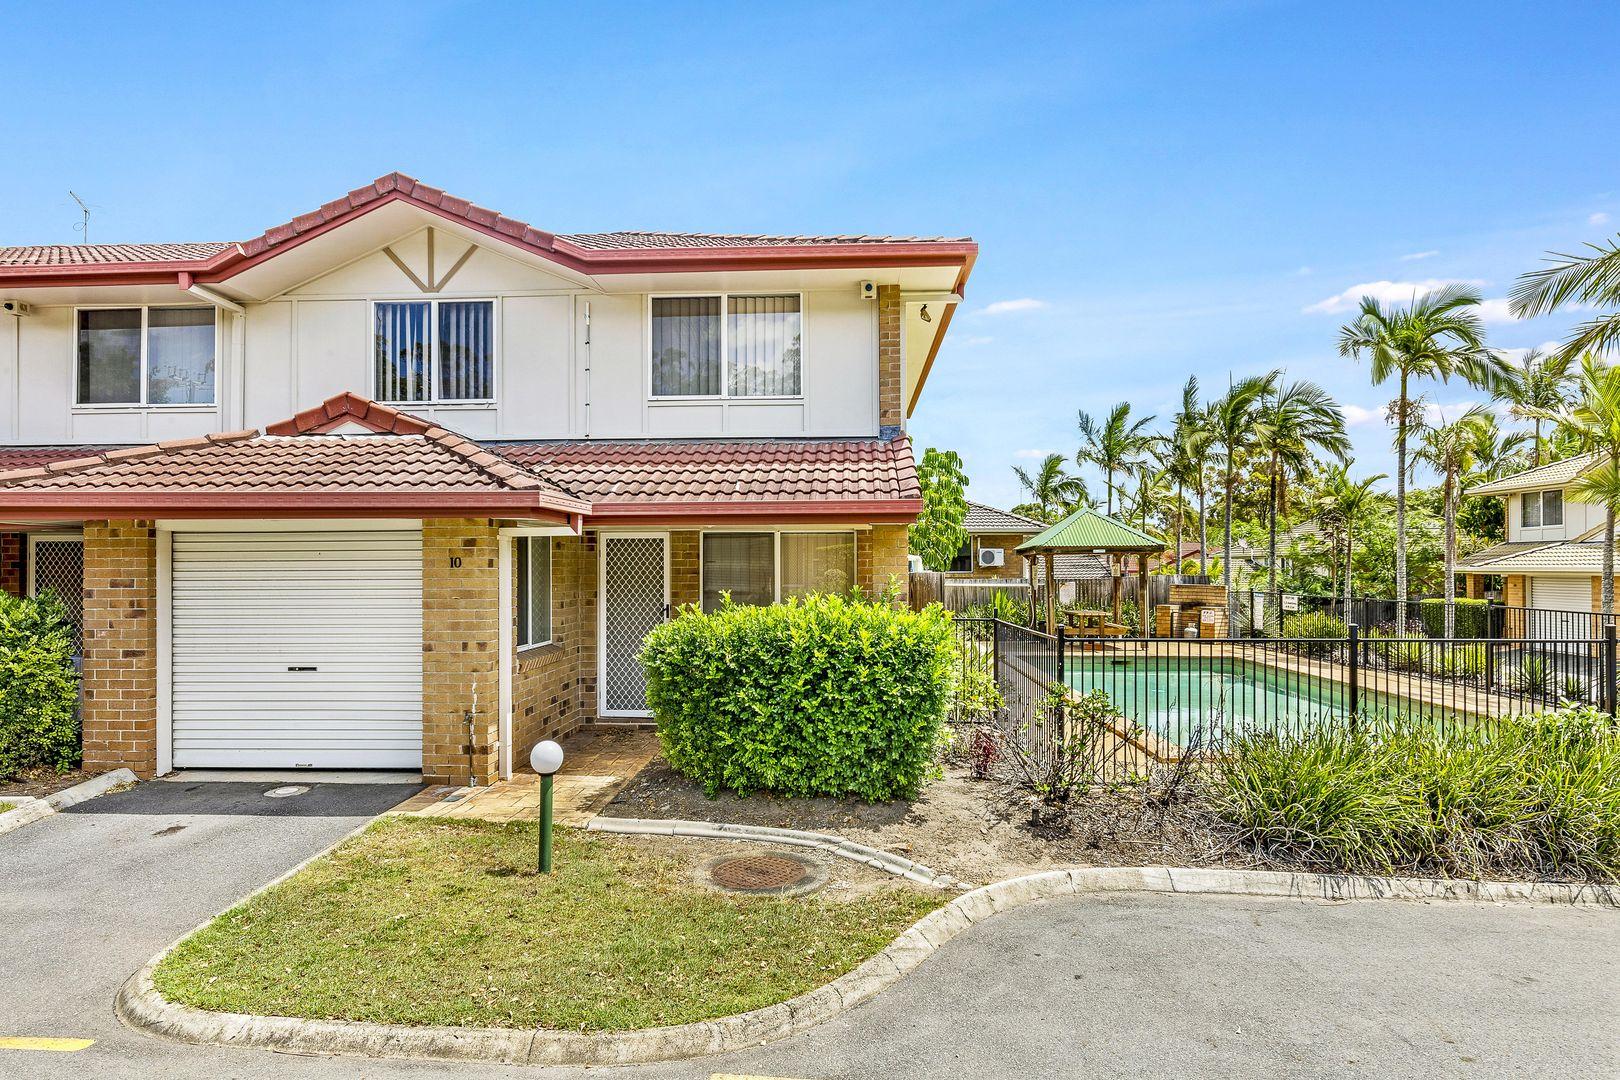 Unit 10/122 Johnson Road, Hillcrest QLD 4118, Image 0